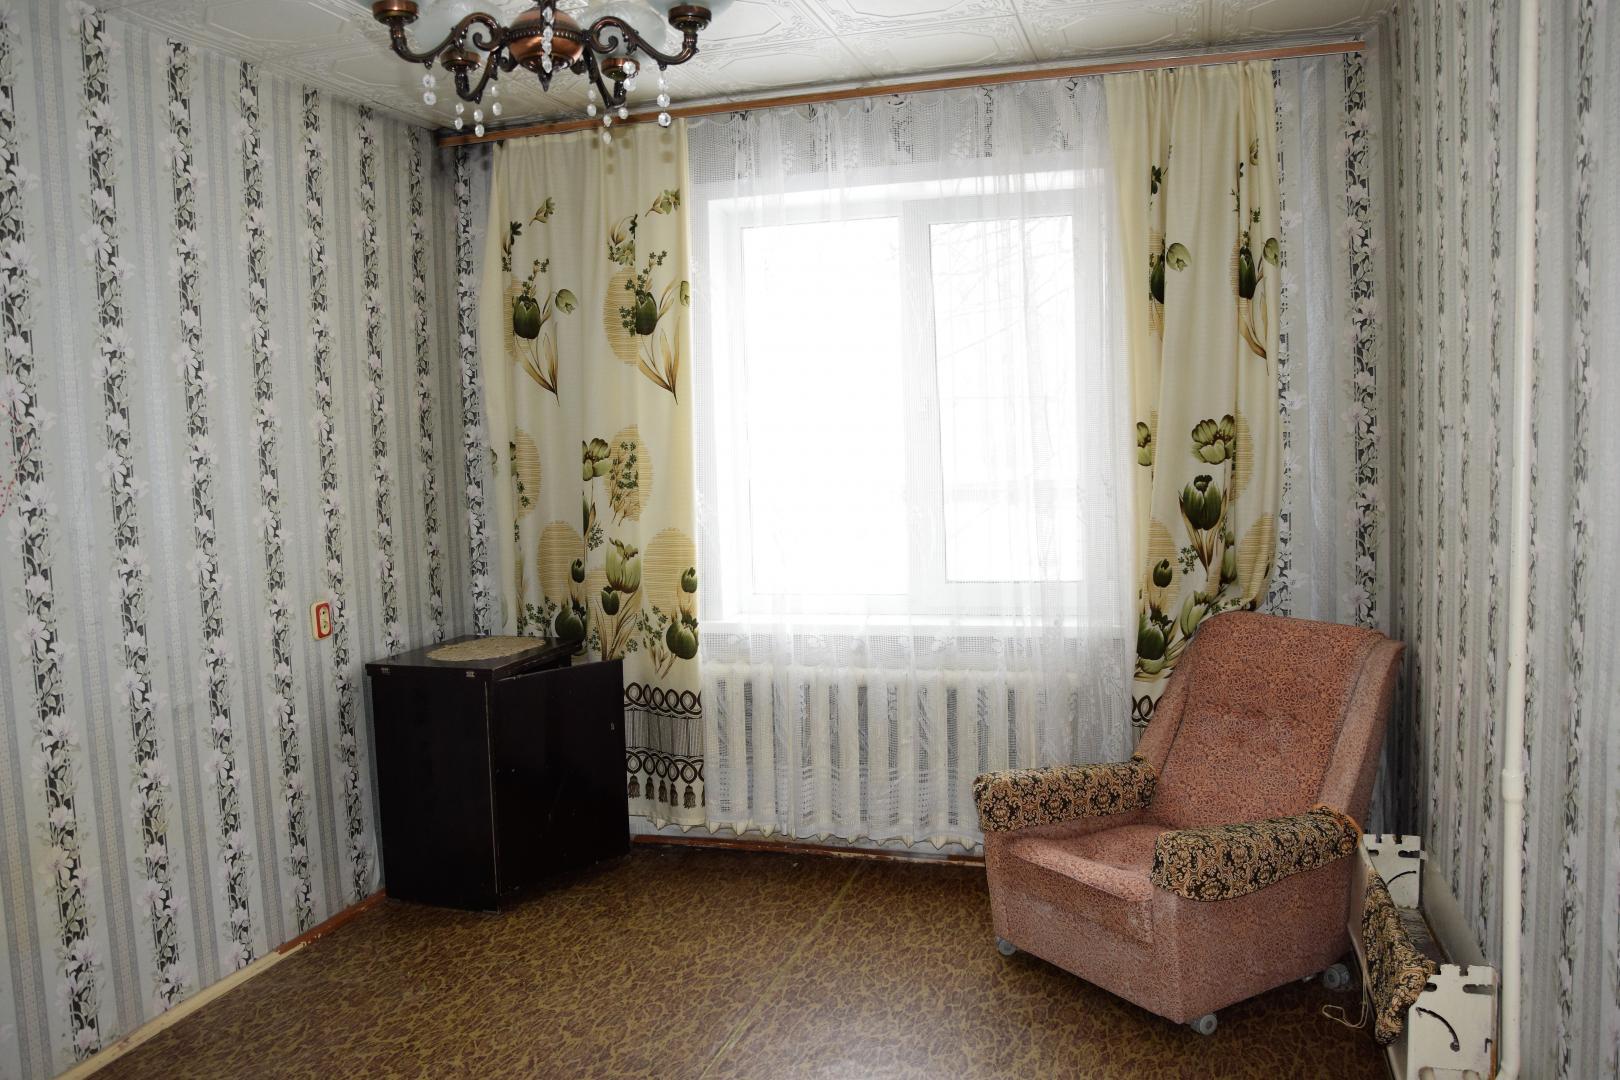 Продажа 2-к квартиры маршала чуйкова, 25А